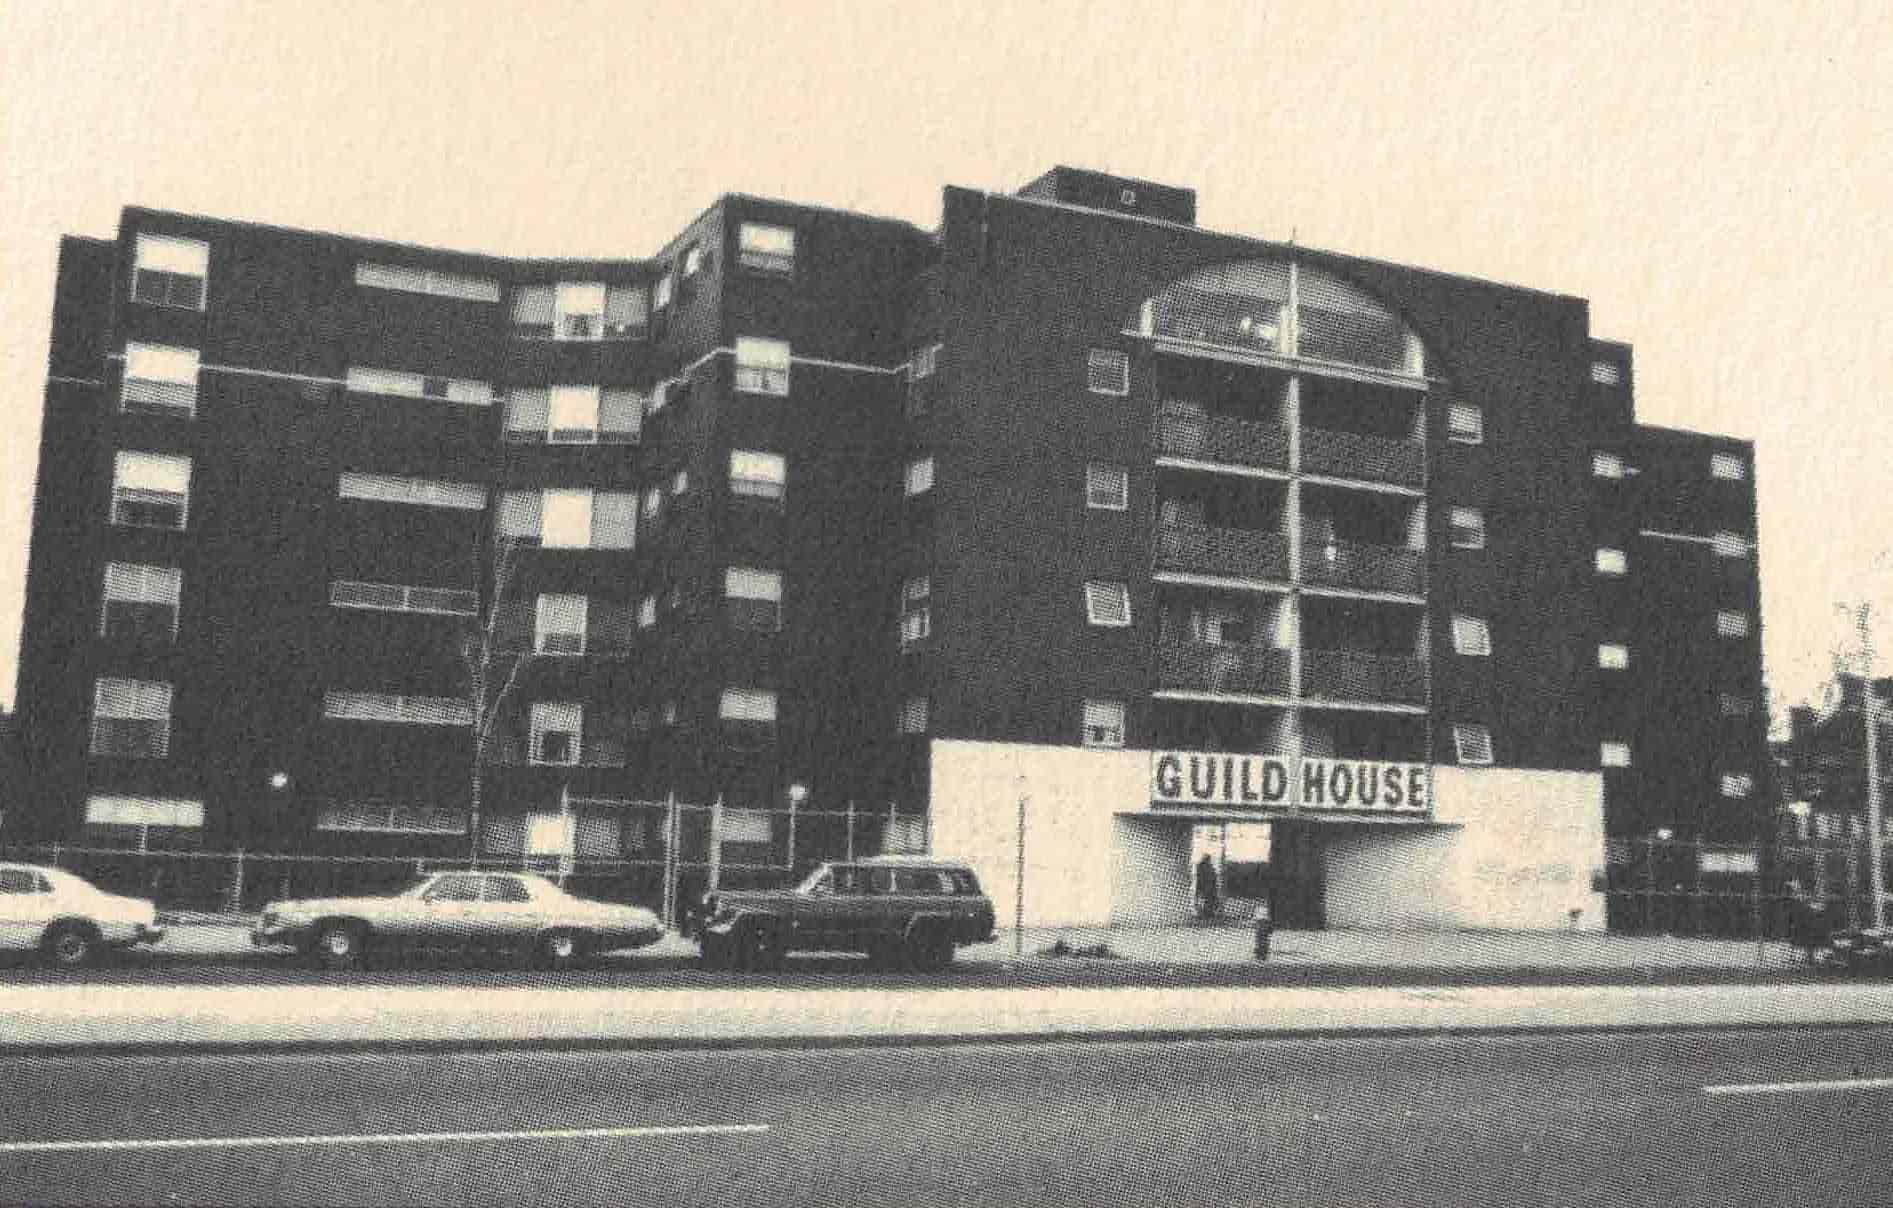 Figura 12. Venturi e Rauch, Guild House, Filadélfia, 1963